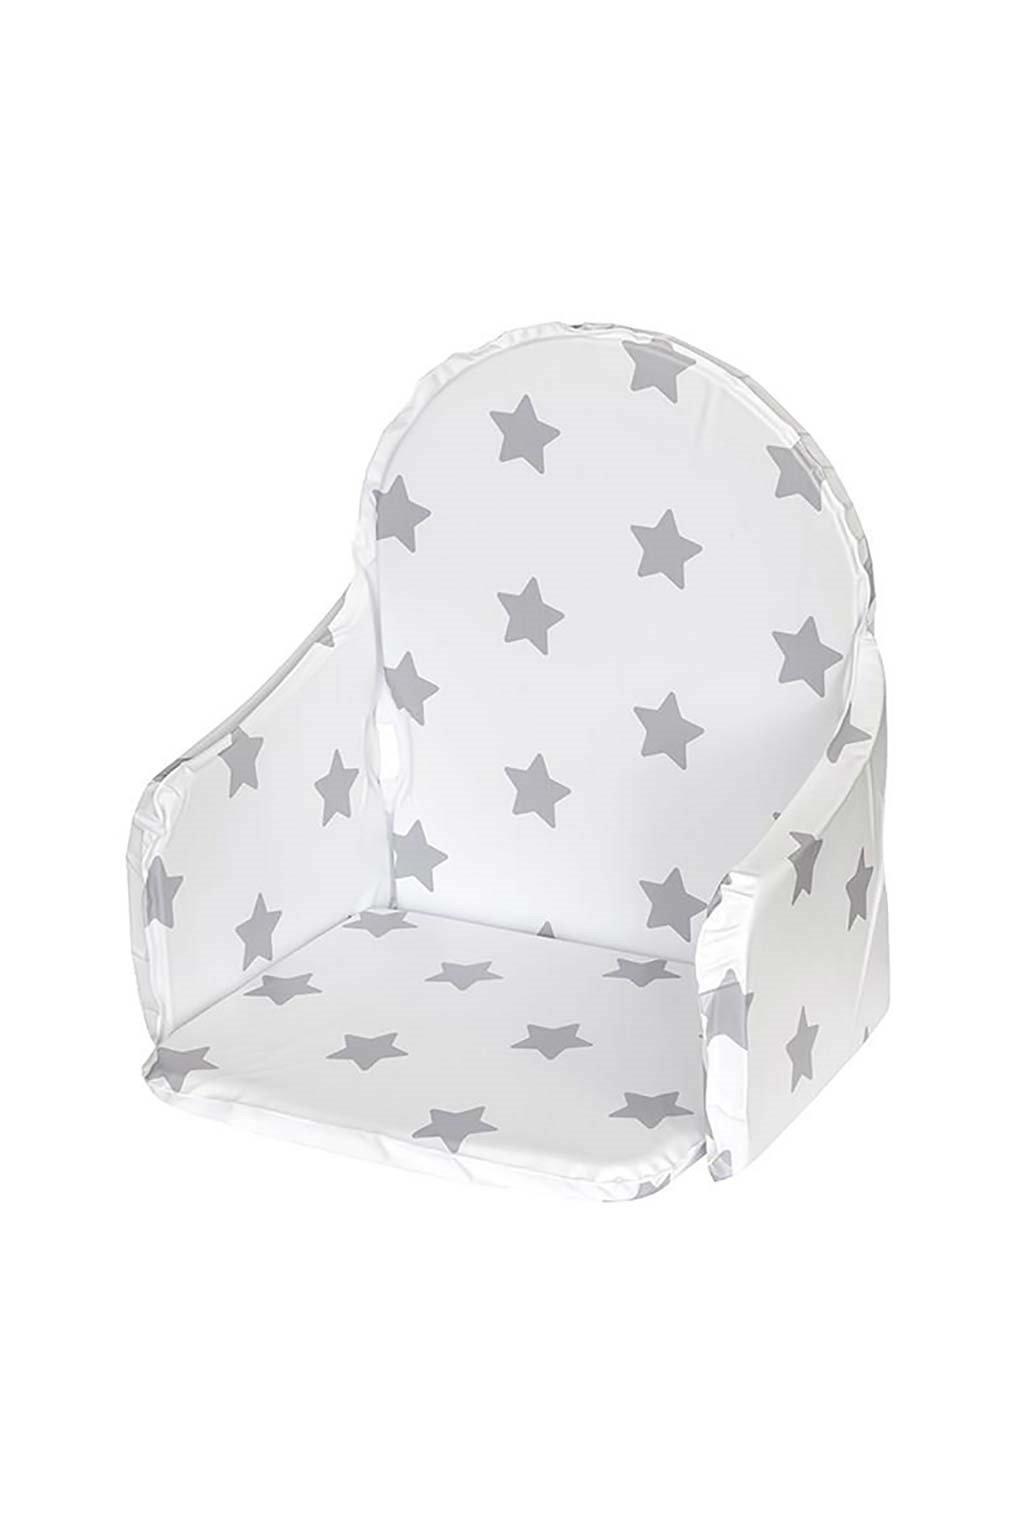 Vložka do drevených jedálenských stoličiek typu New Baby Victory biela hviezdičky sivé